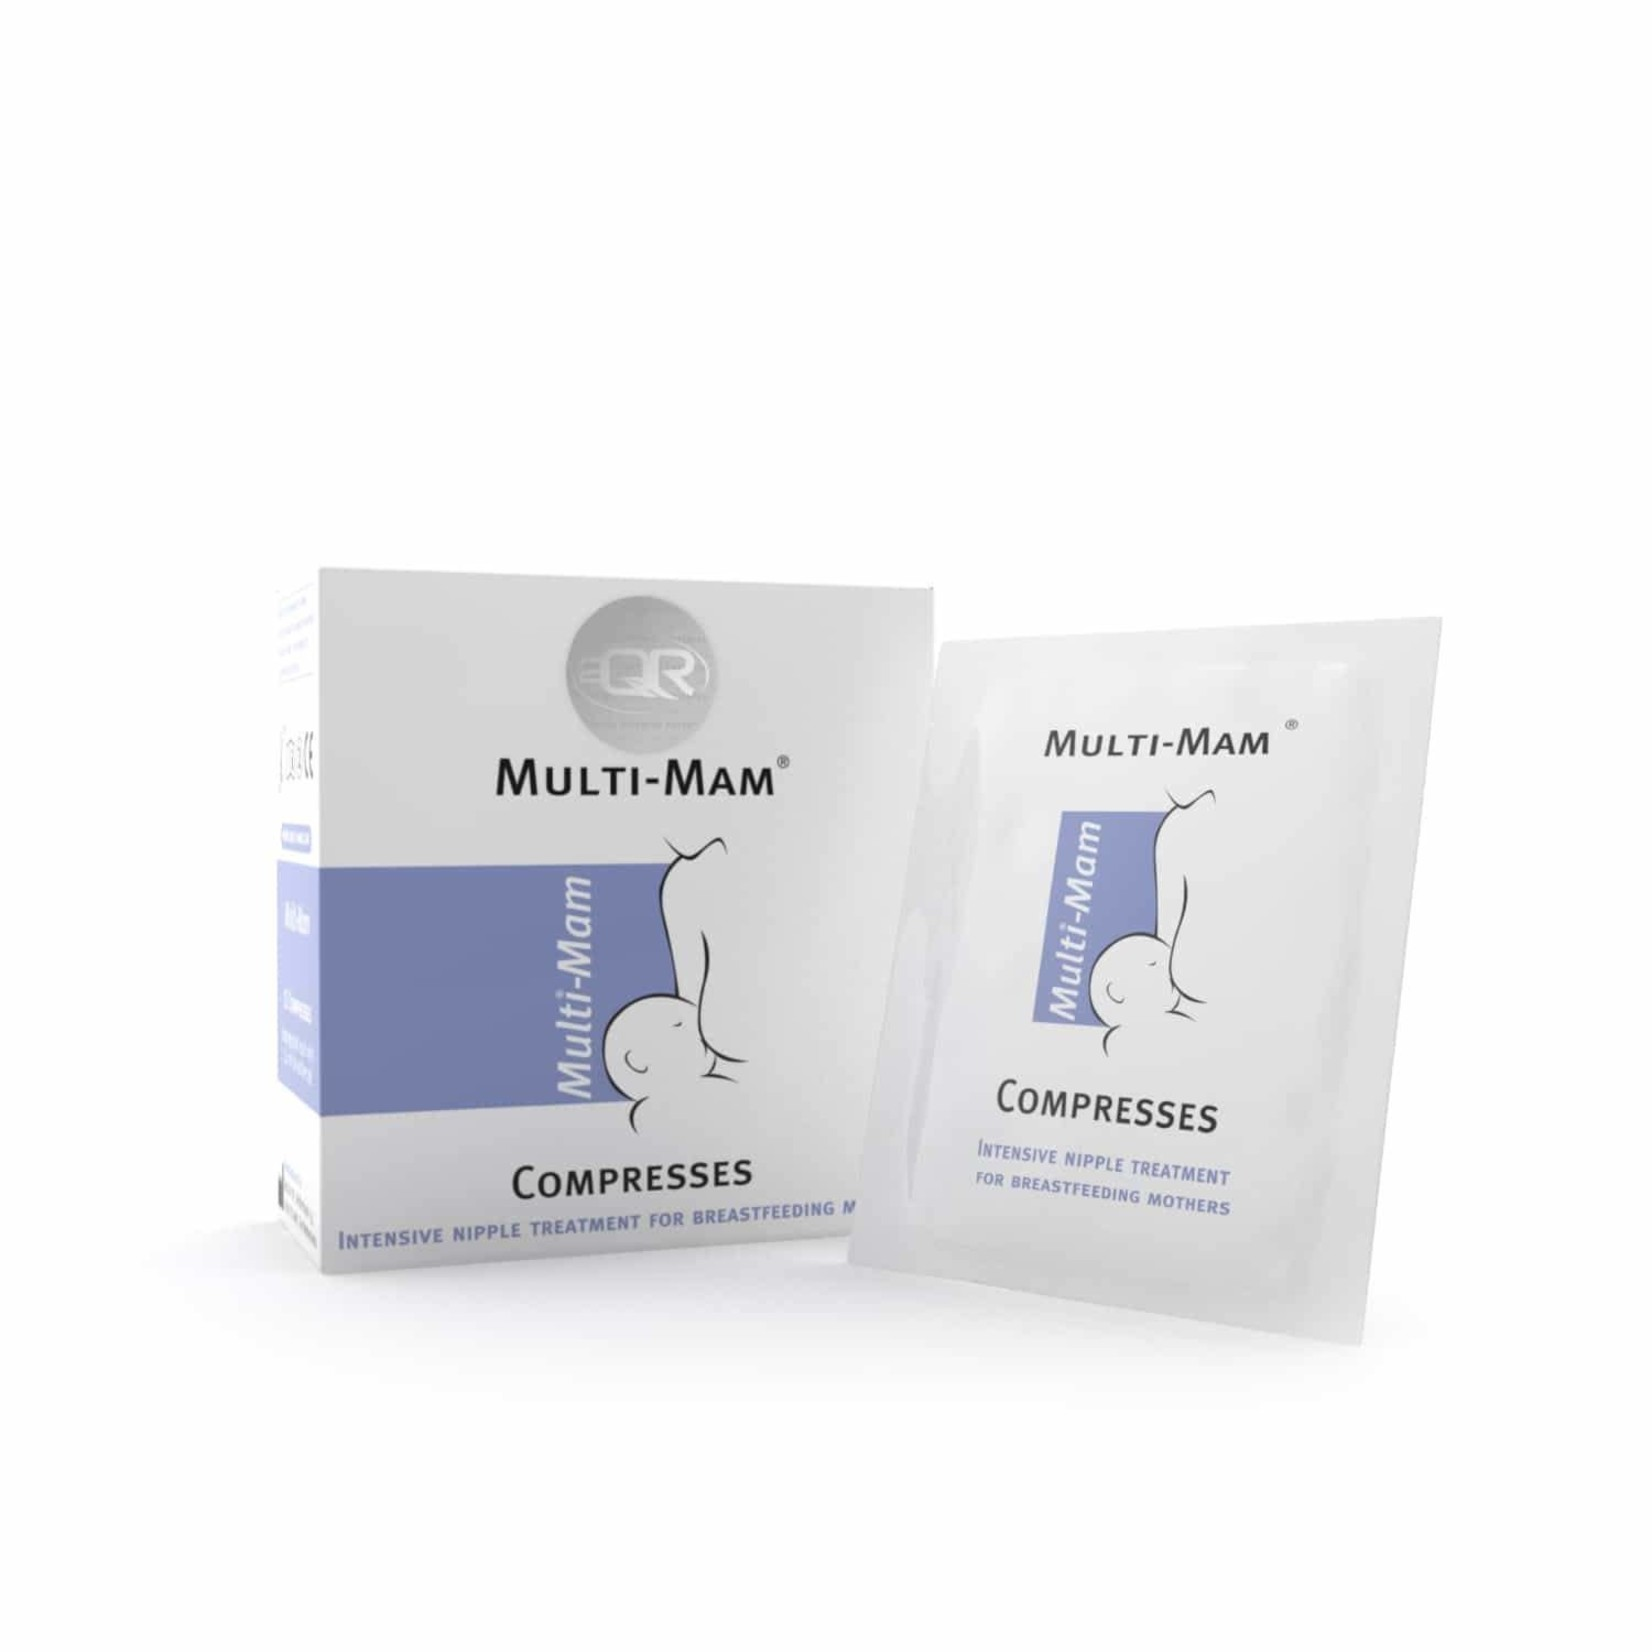 Multi-Mam Kompressen (12 stuks)